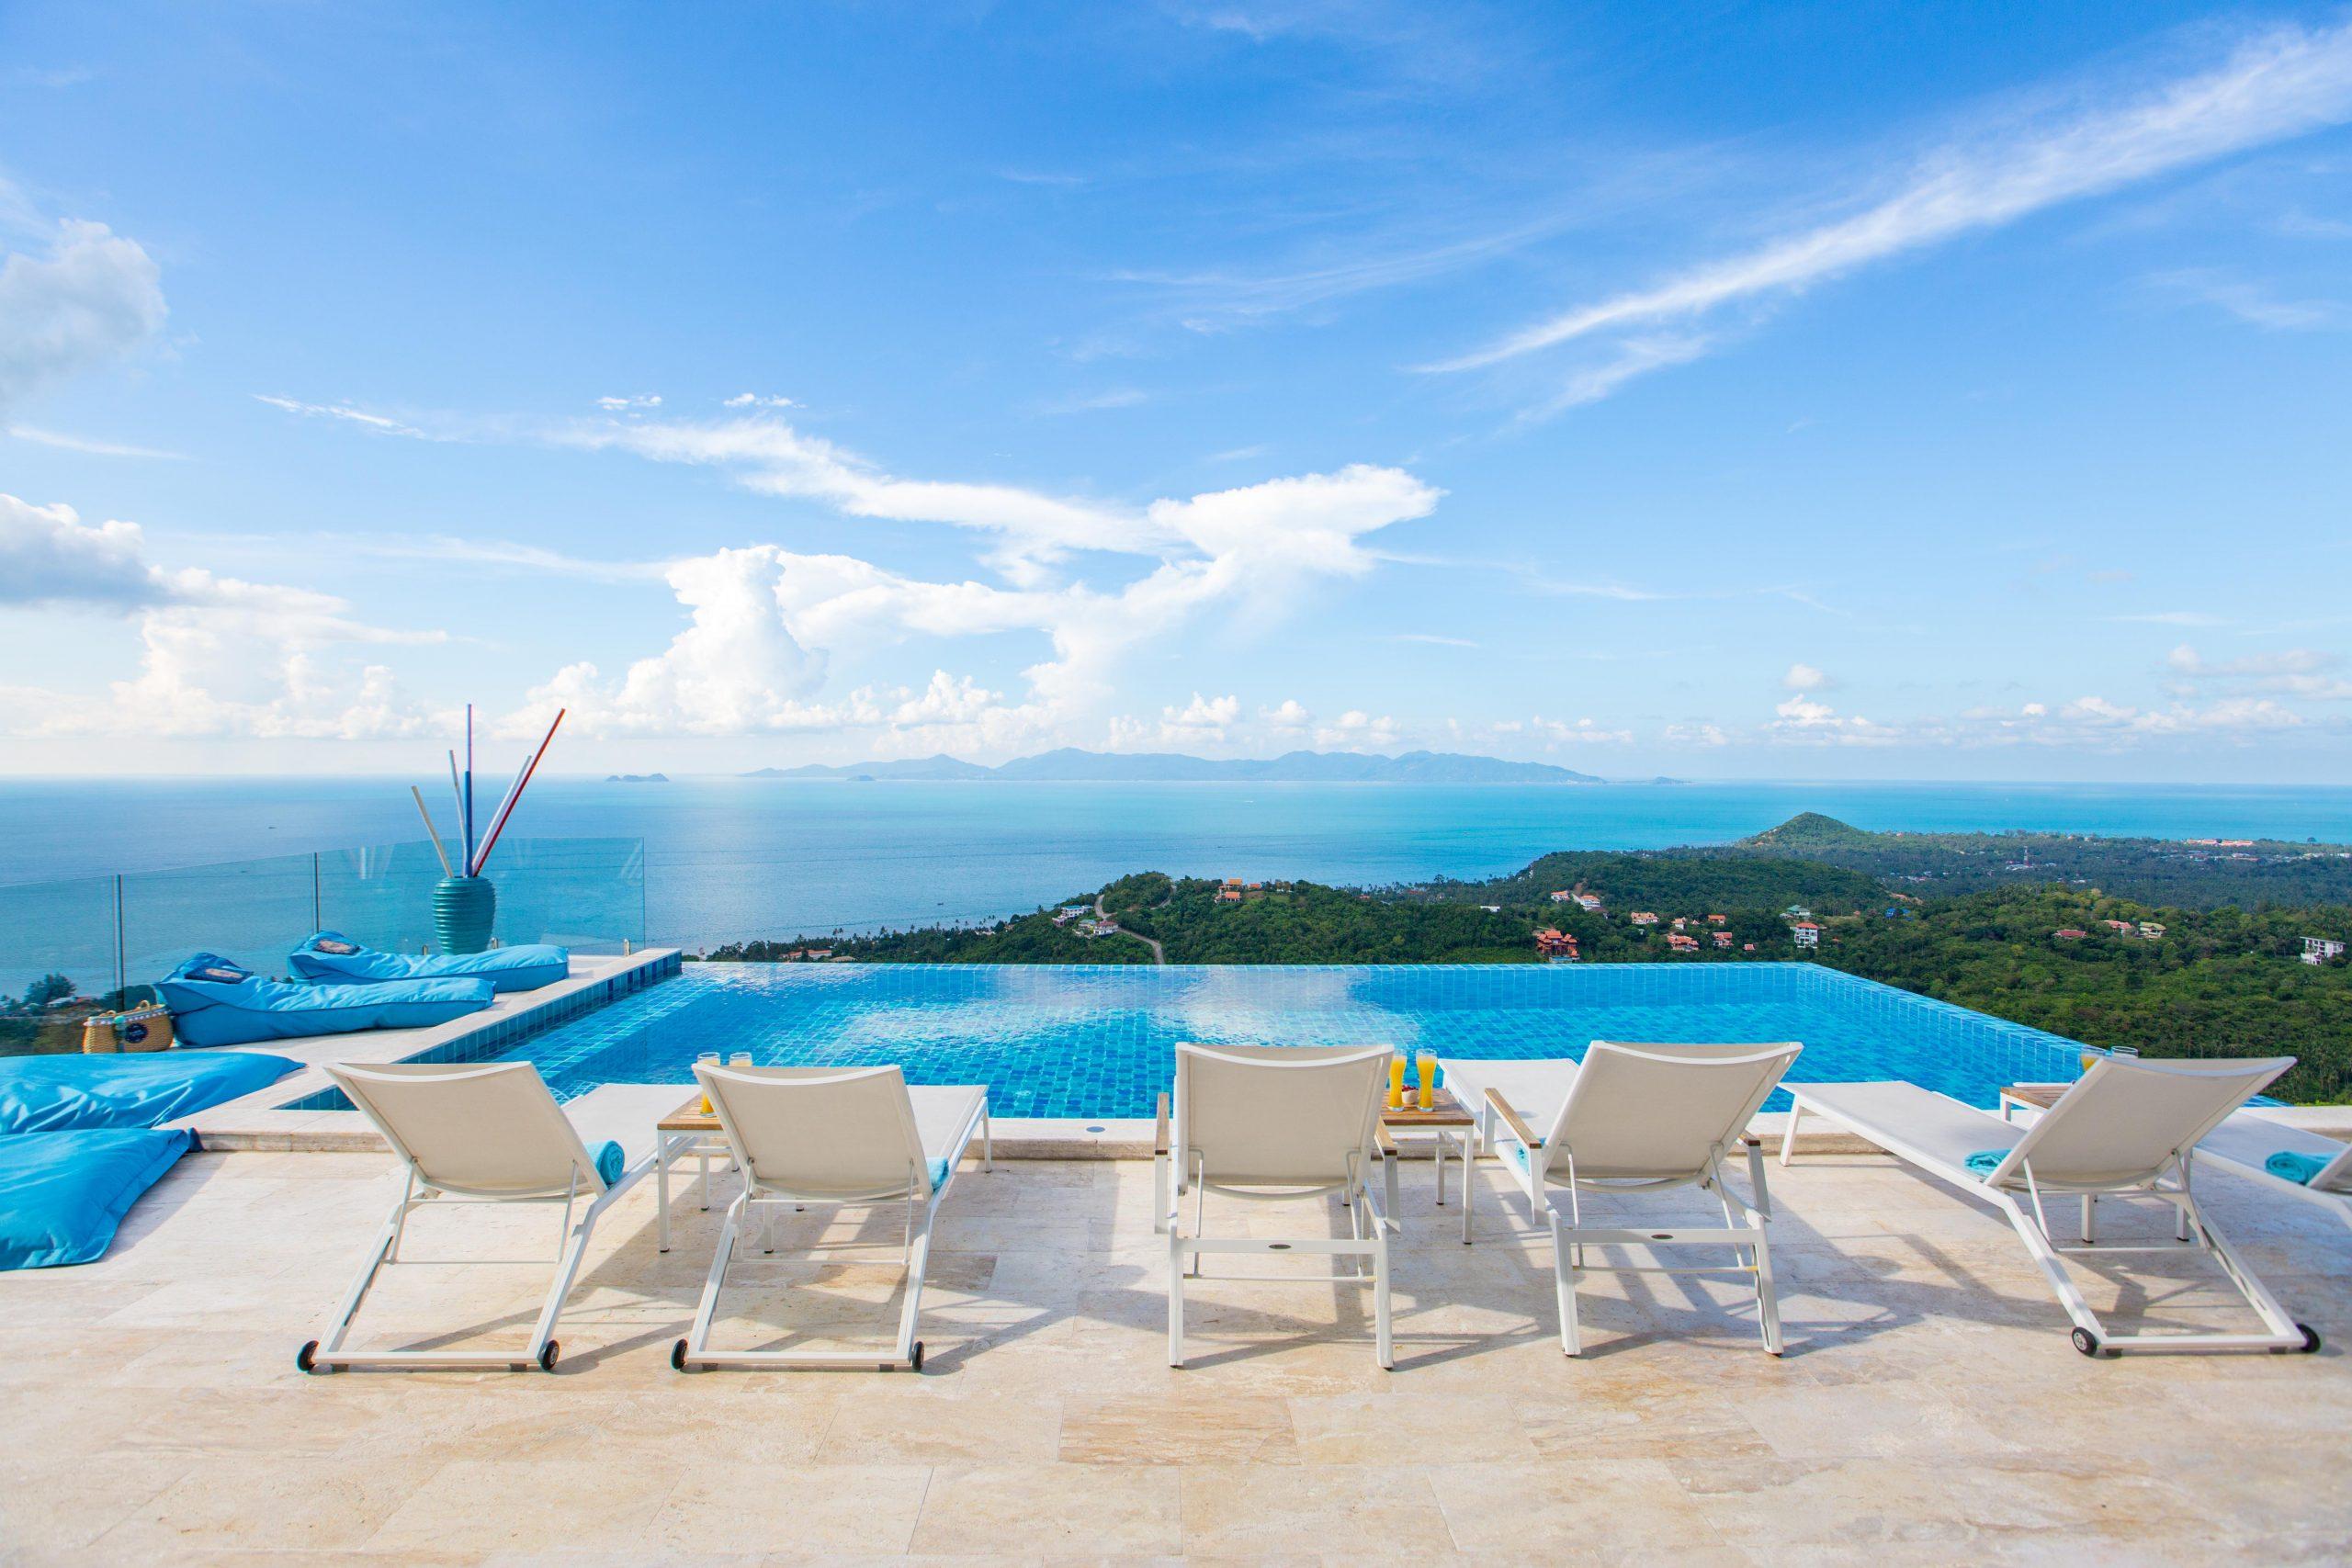 samui-sunset-baan-cyan-villa-you-chill-we-work-koh-samui-thailand-conciergerie-concierge-service-villa-for-rent-for-sale-luxury